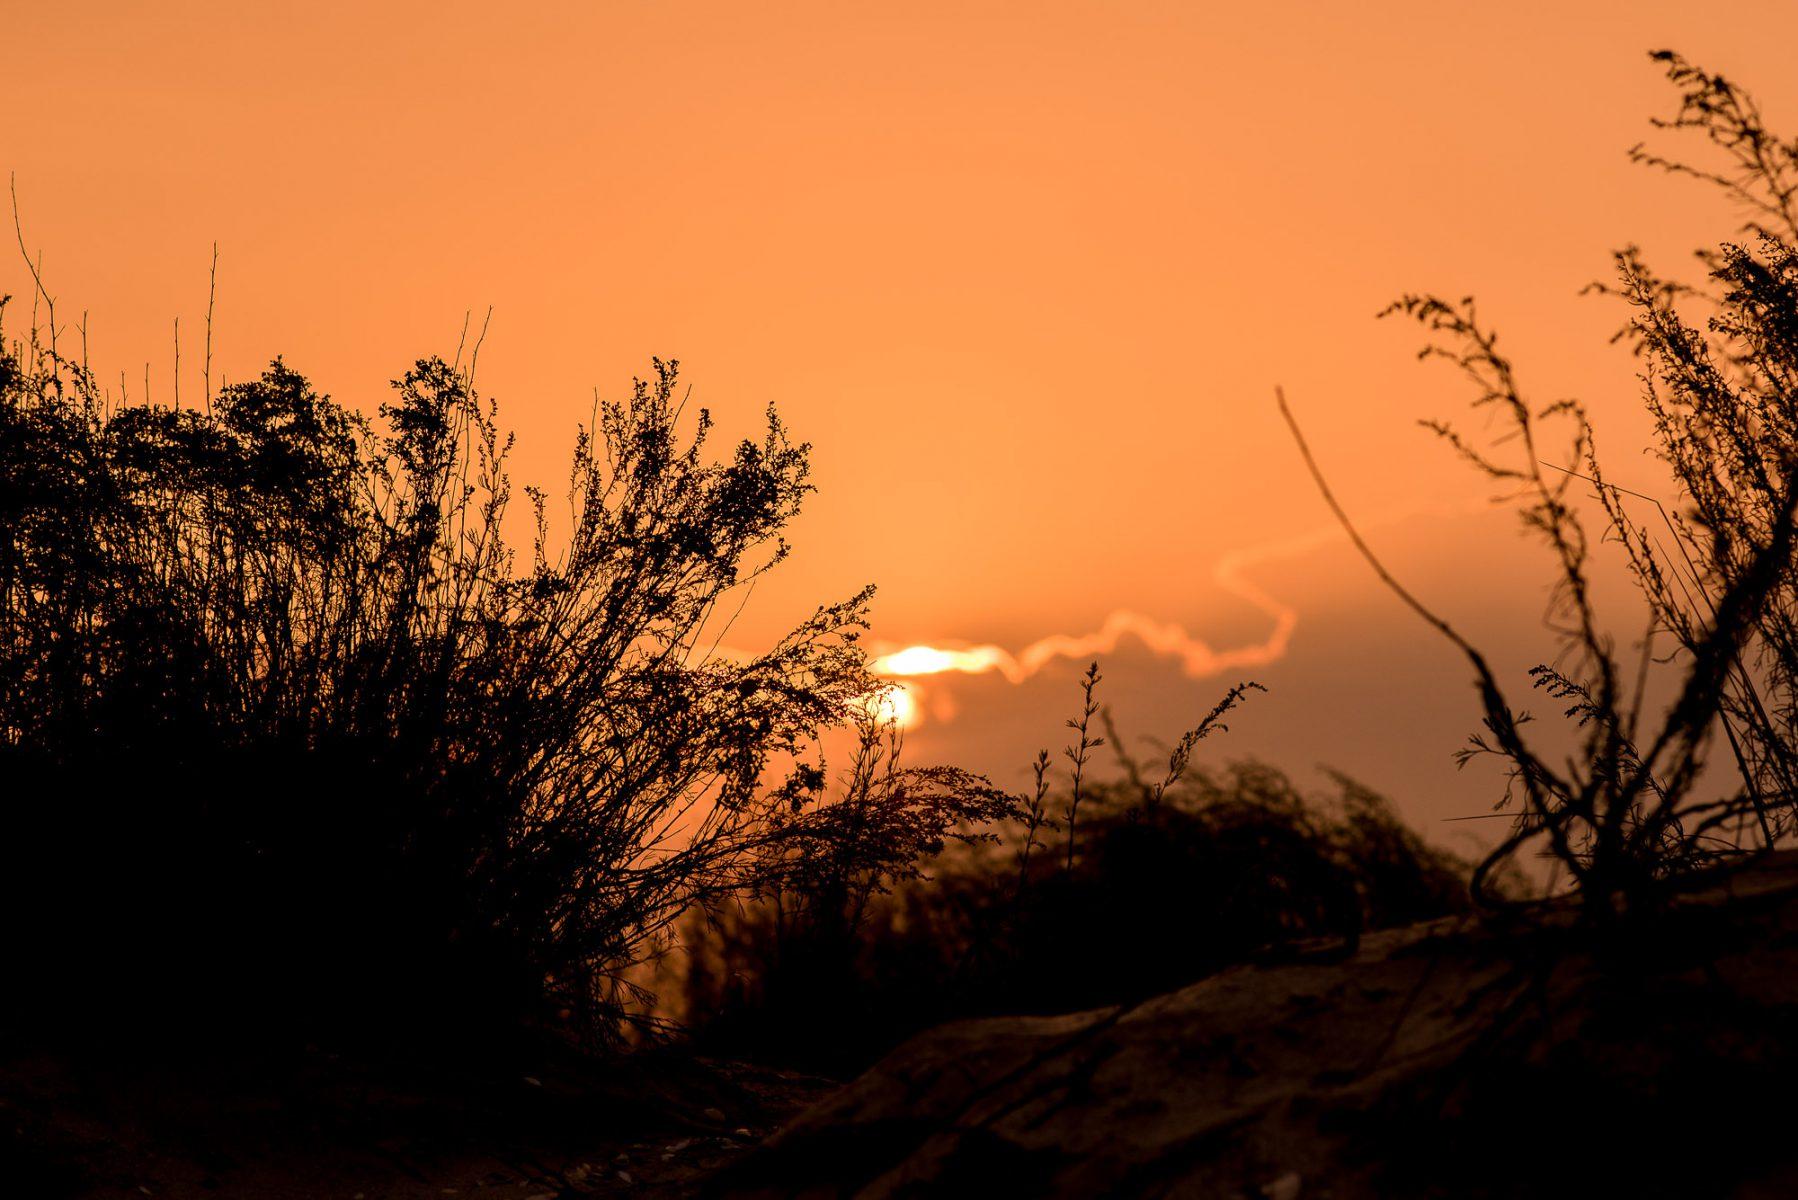 sunset on a beach photo shoot